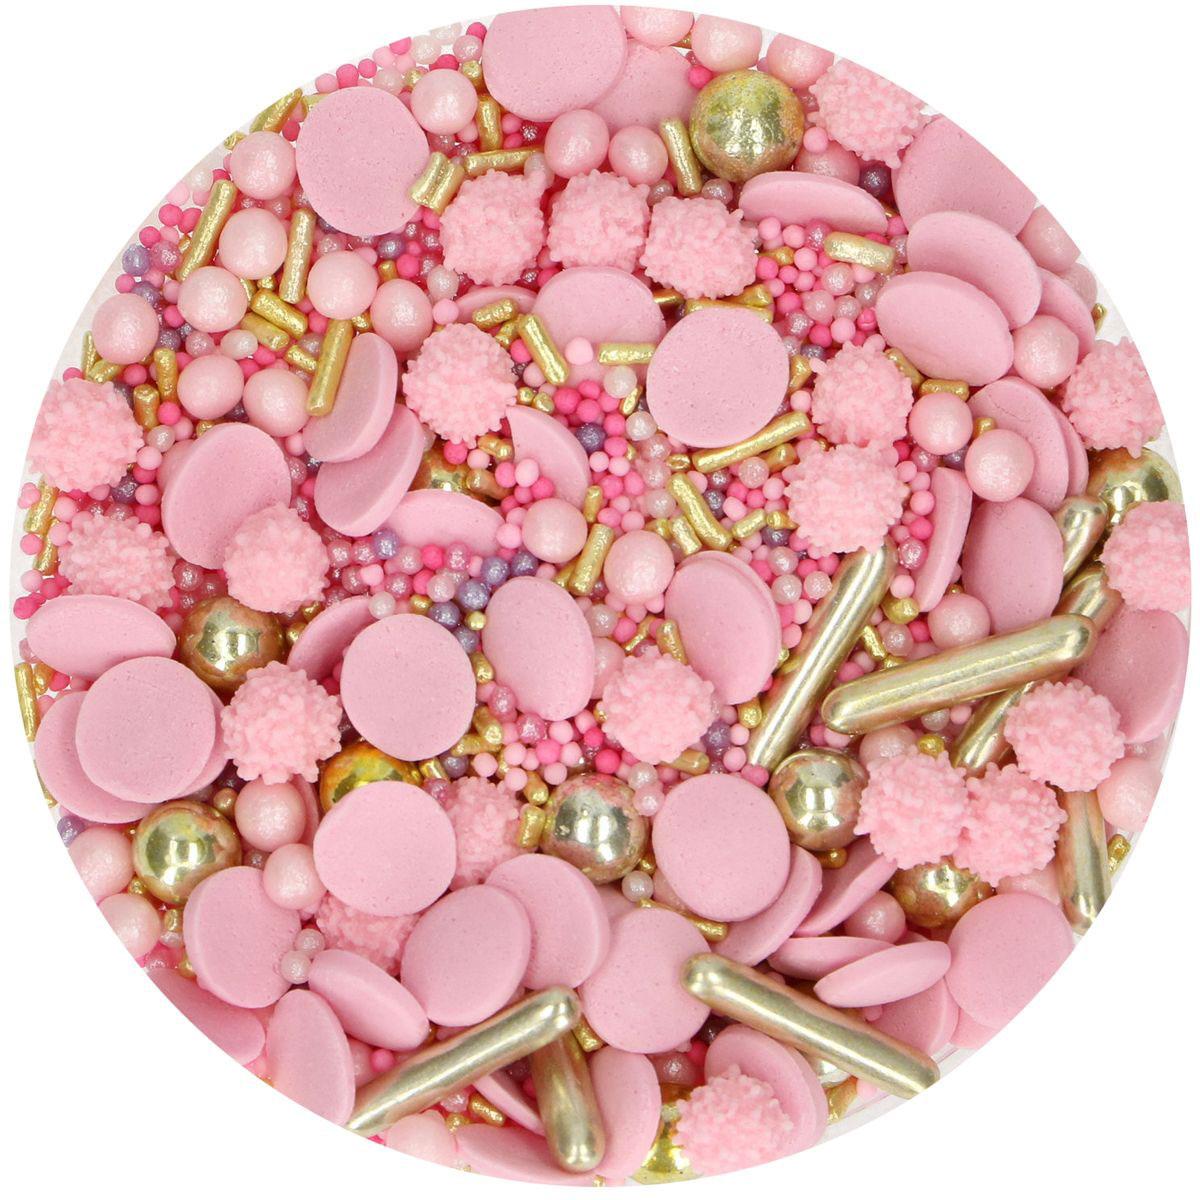 Funcakes Sprinkles Medley - Glamour Pink 65g